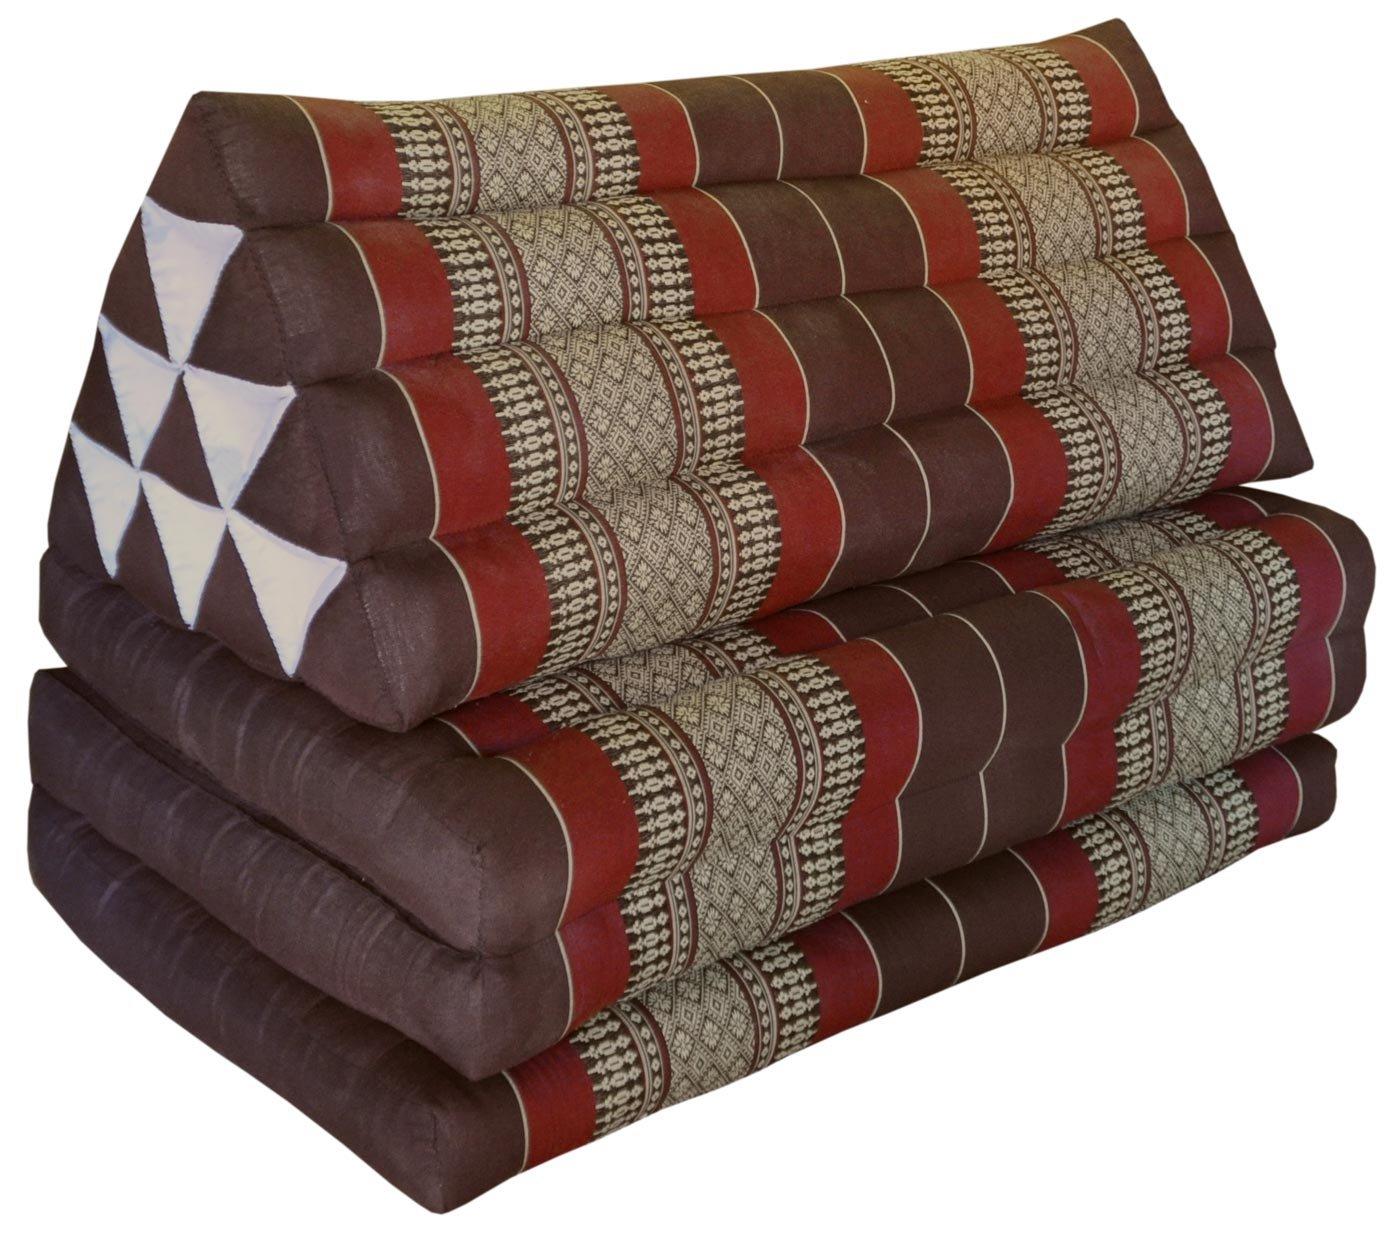 Thai triangle cushion/mattress XXL, with 3 folding seats, brown/burgundy, sofa, relaxation, beach, pool, meditation, yoga, made in Thailand. (82518)